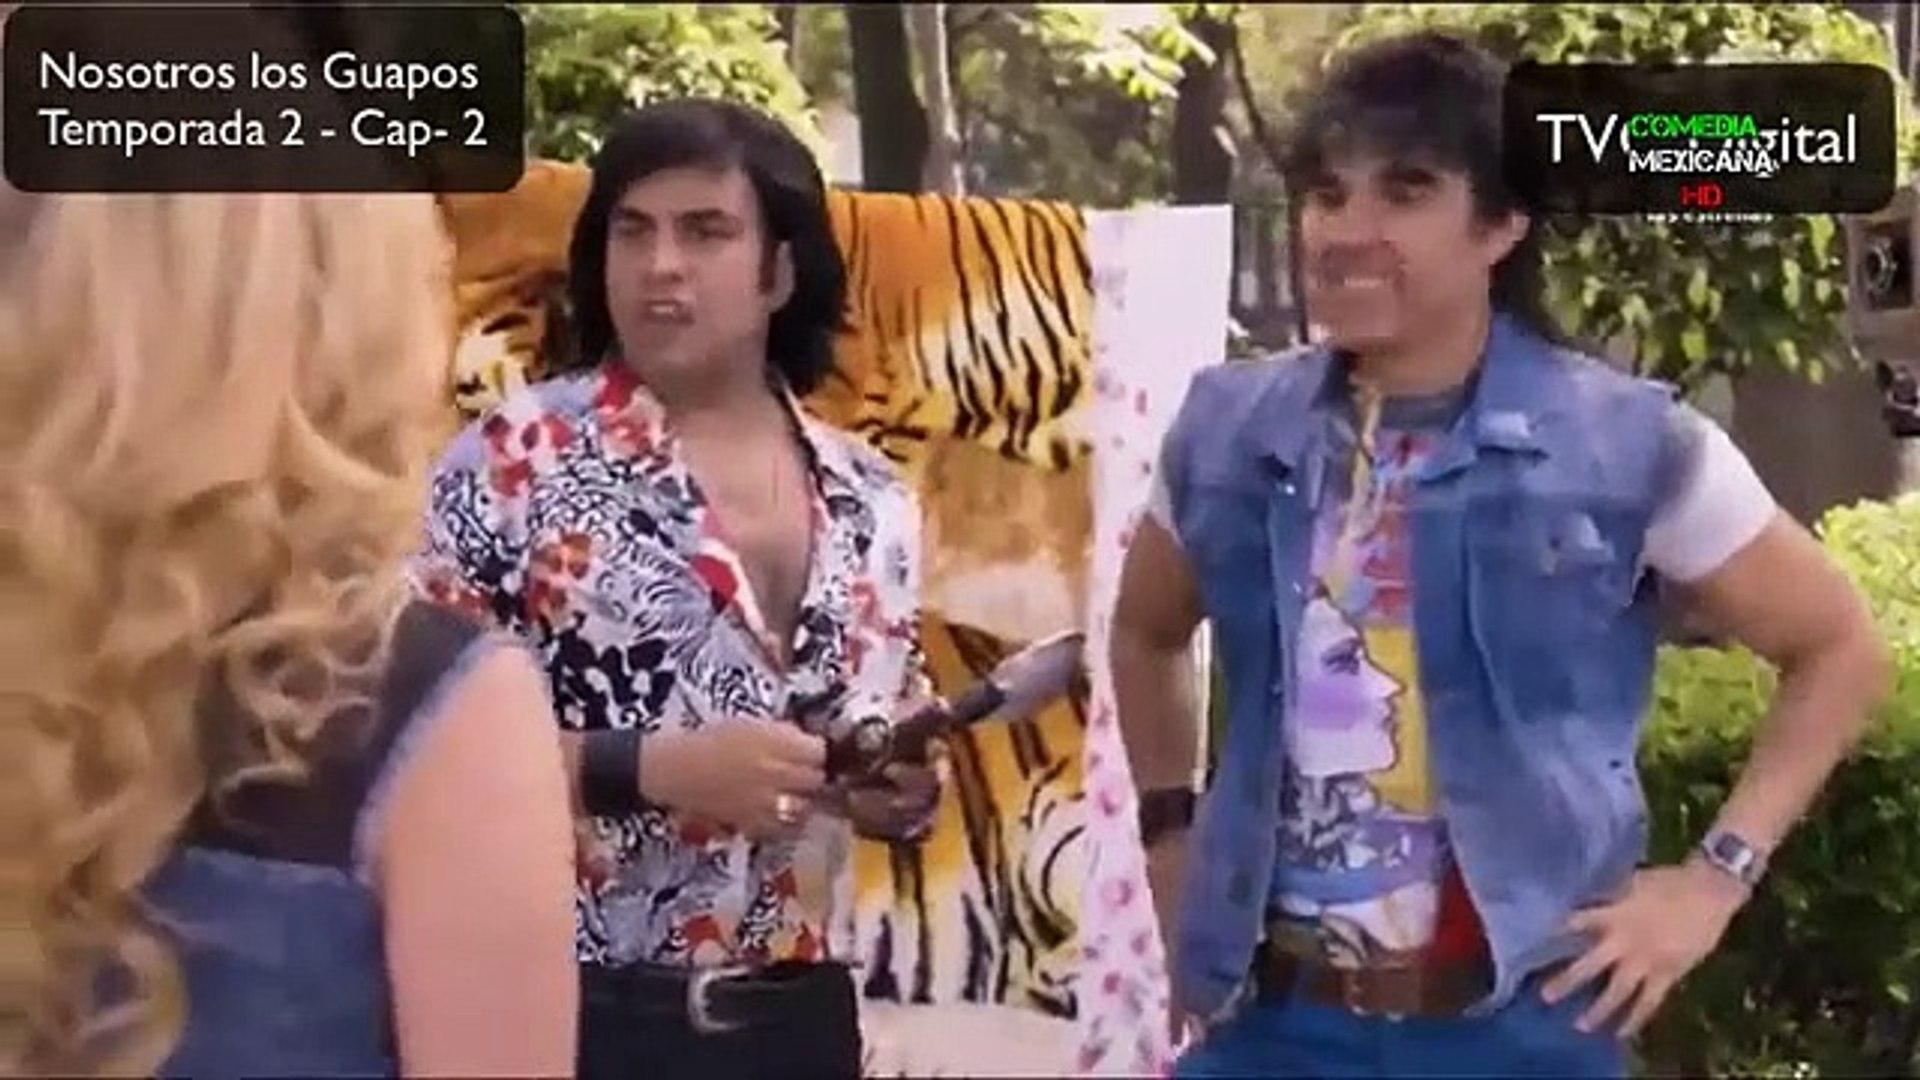 Nosotros Lo Guapos Segunda Temporada Episode 2 Video Dailymotion 33,888 likes · 201 talking about this. nosotros lo guapos segunda temporada episode 2